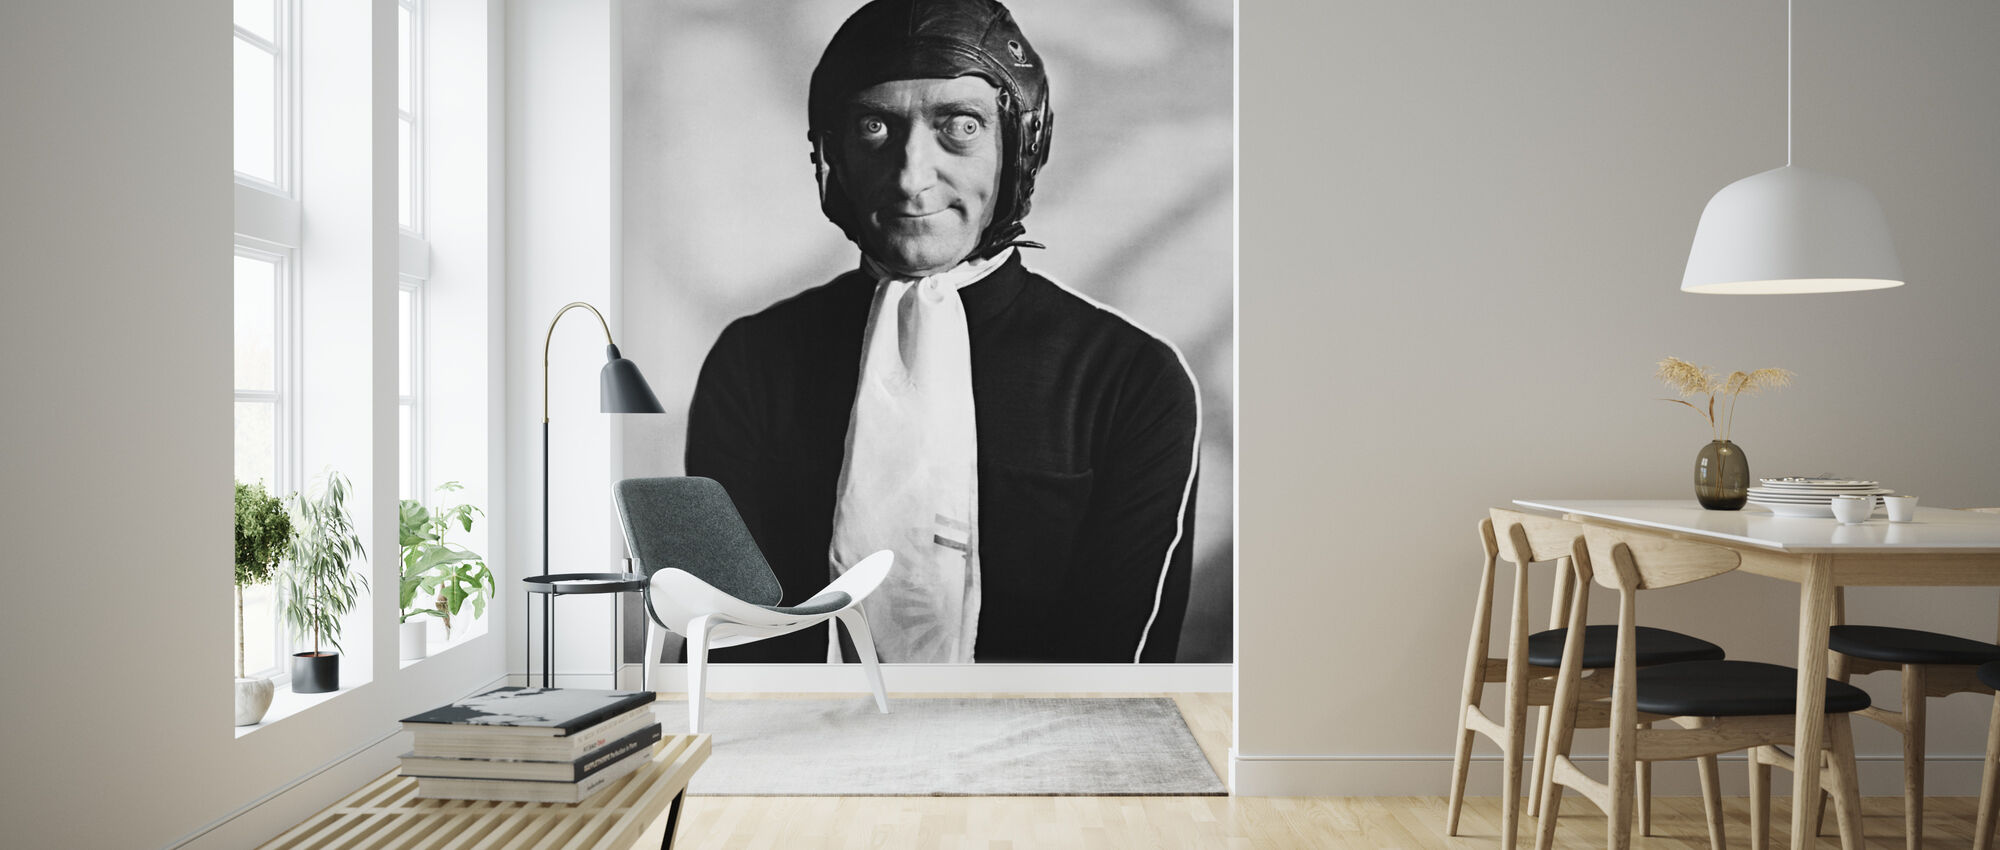 Silent Film - Marty Feldman - Behang - Woonkamer